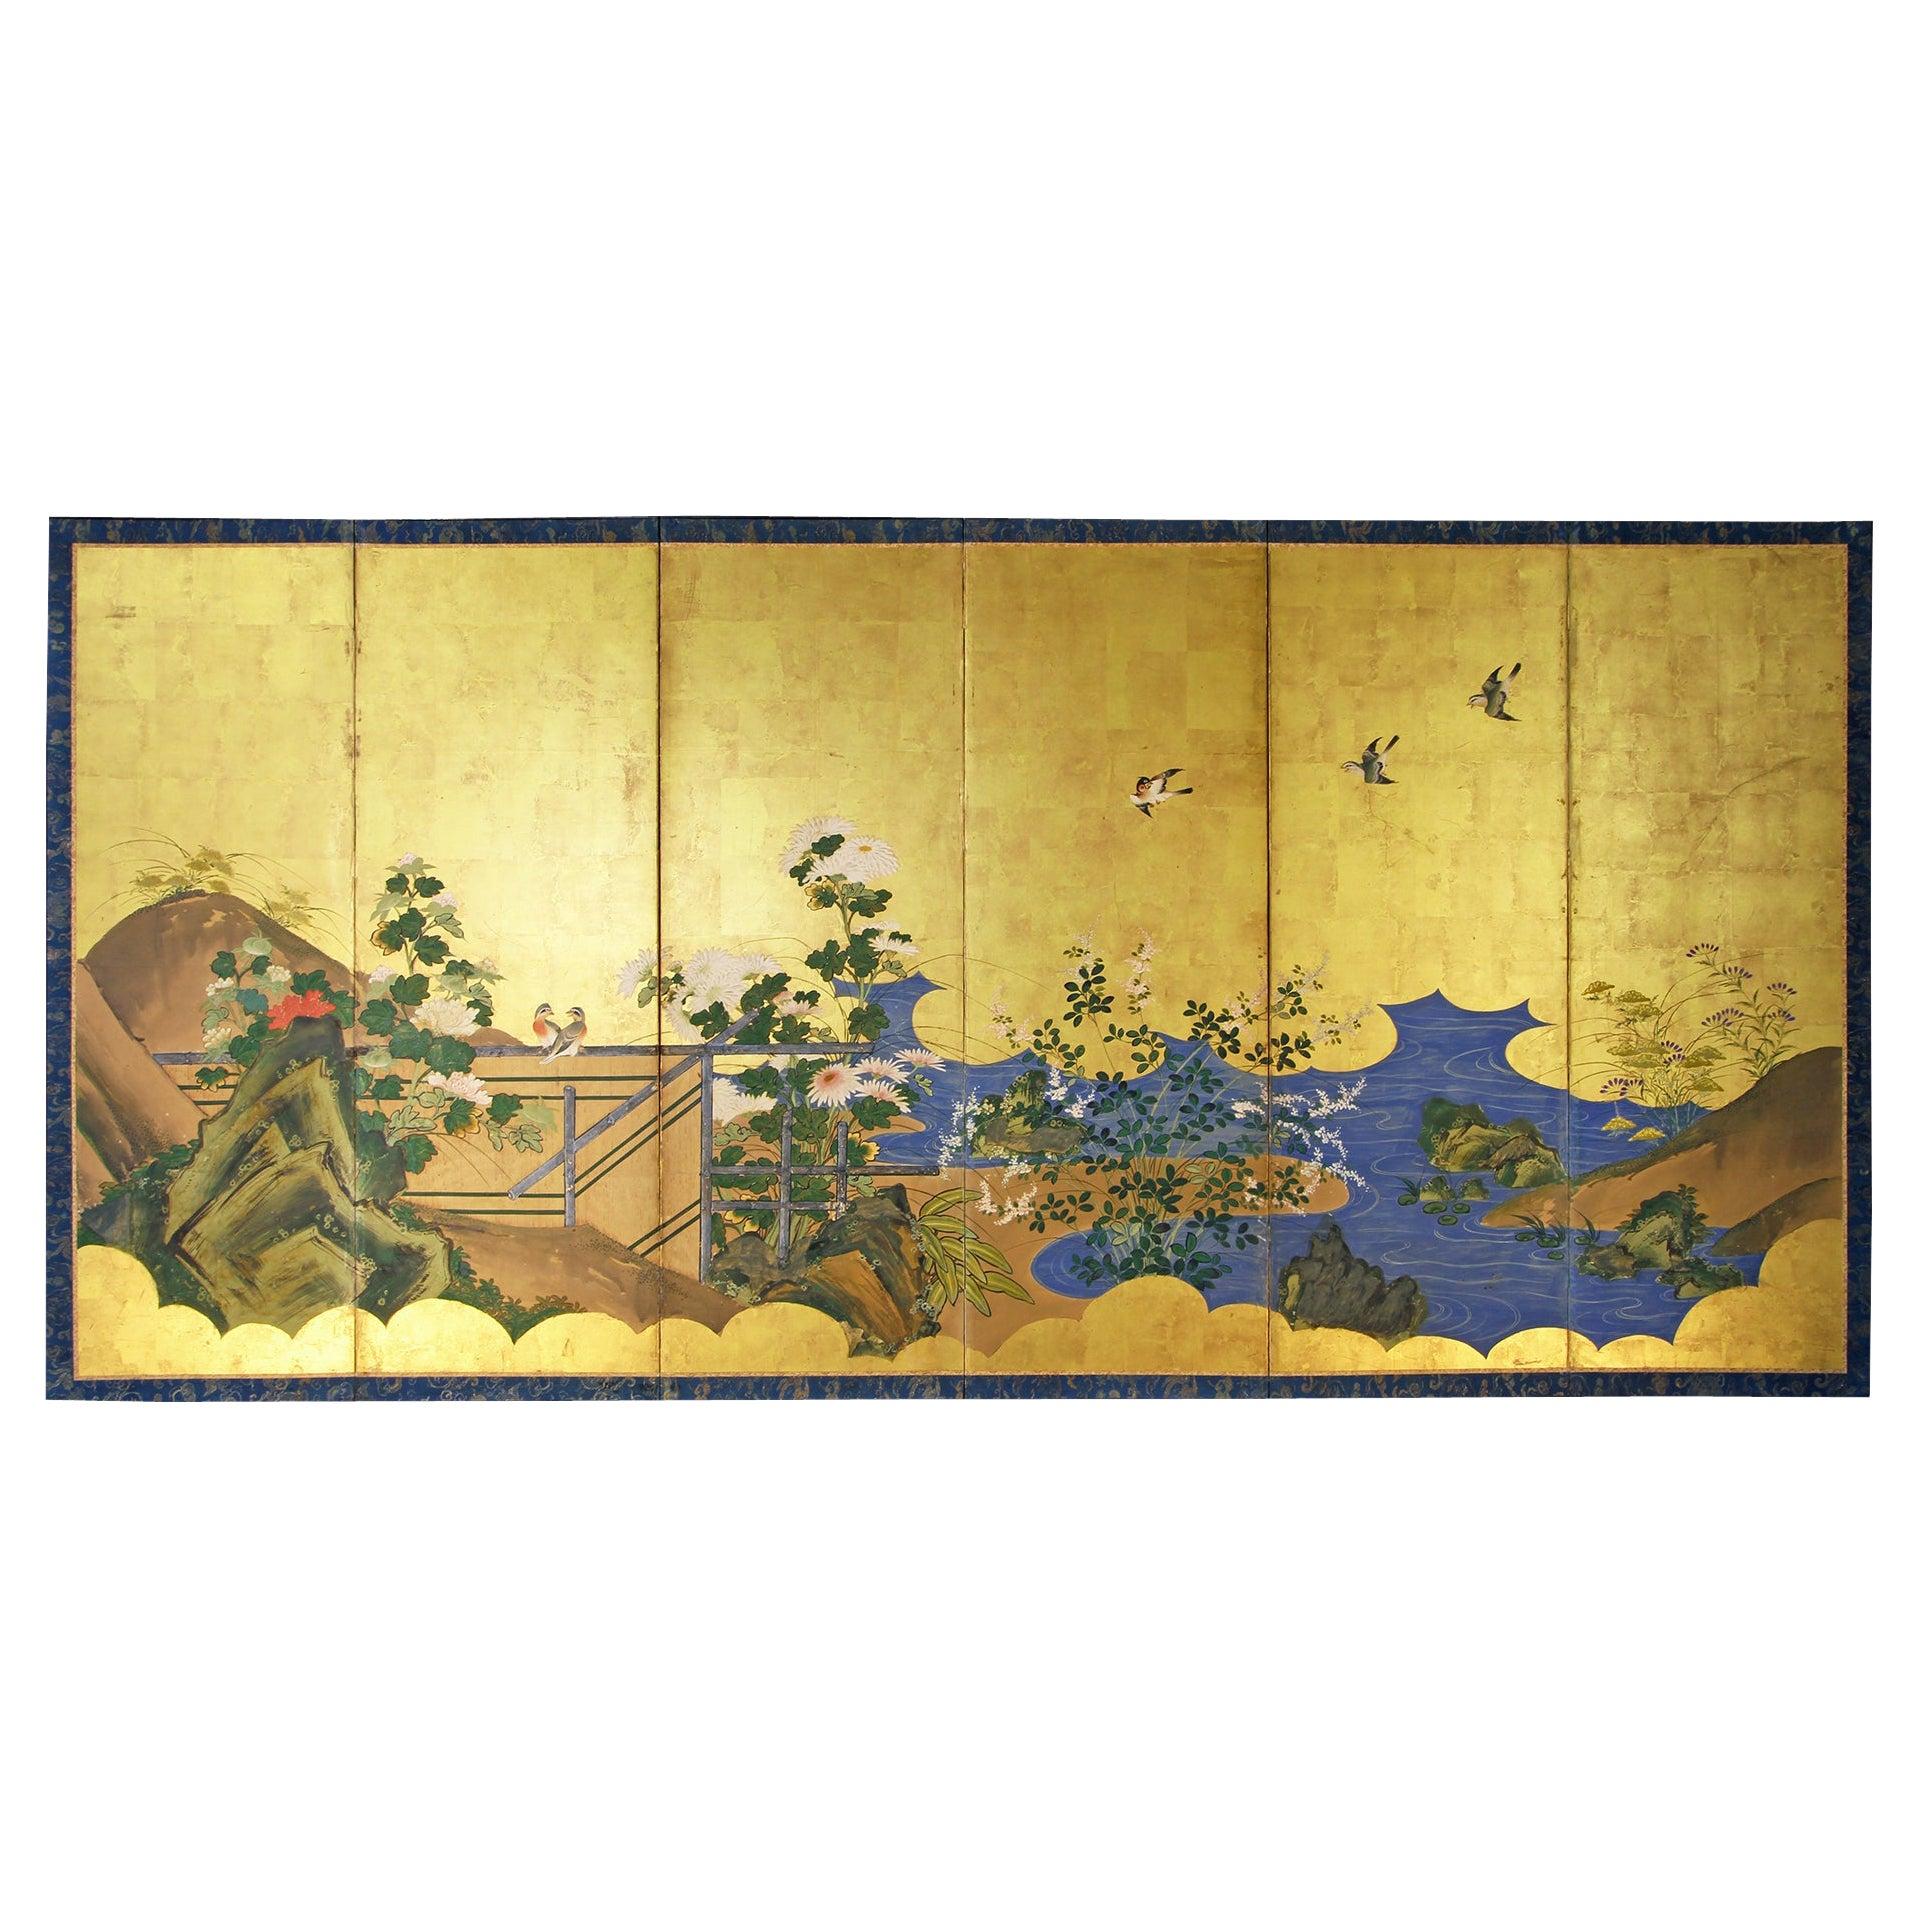 Edo Period, Early 19th Century Japanese Folding Screen by Rinpa School